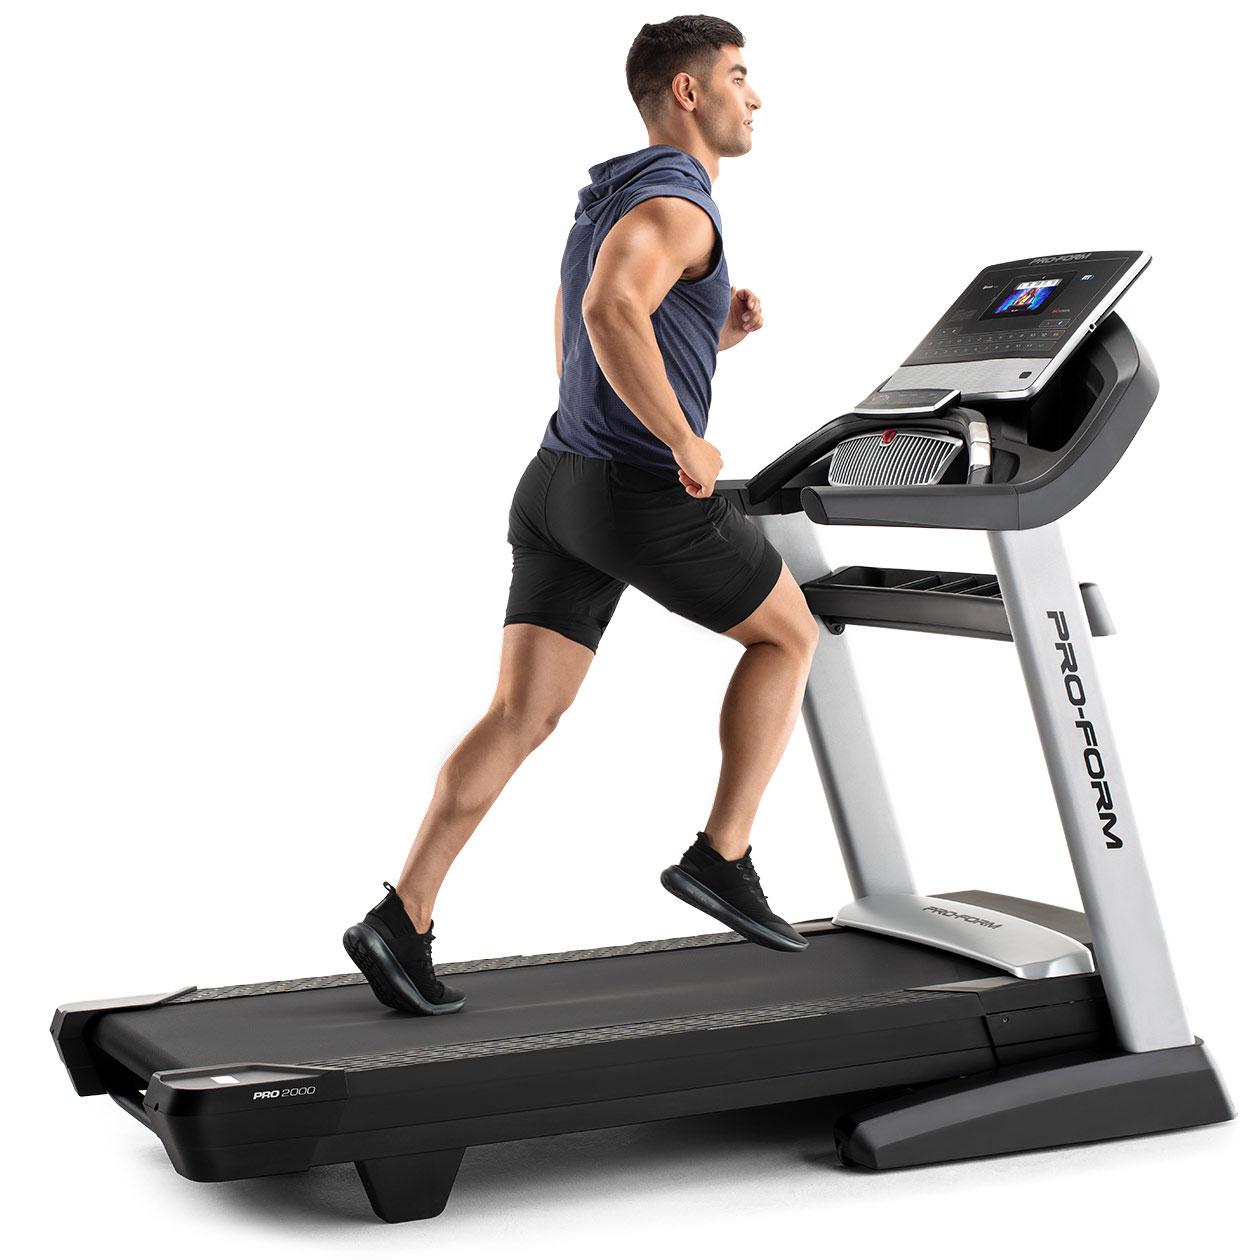 Pro-Form SMART Pro 2000 Treadmill